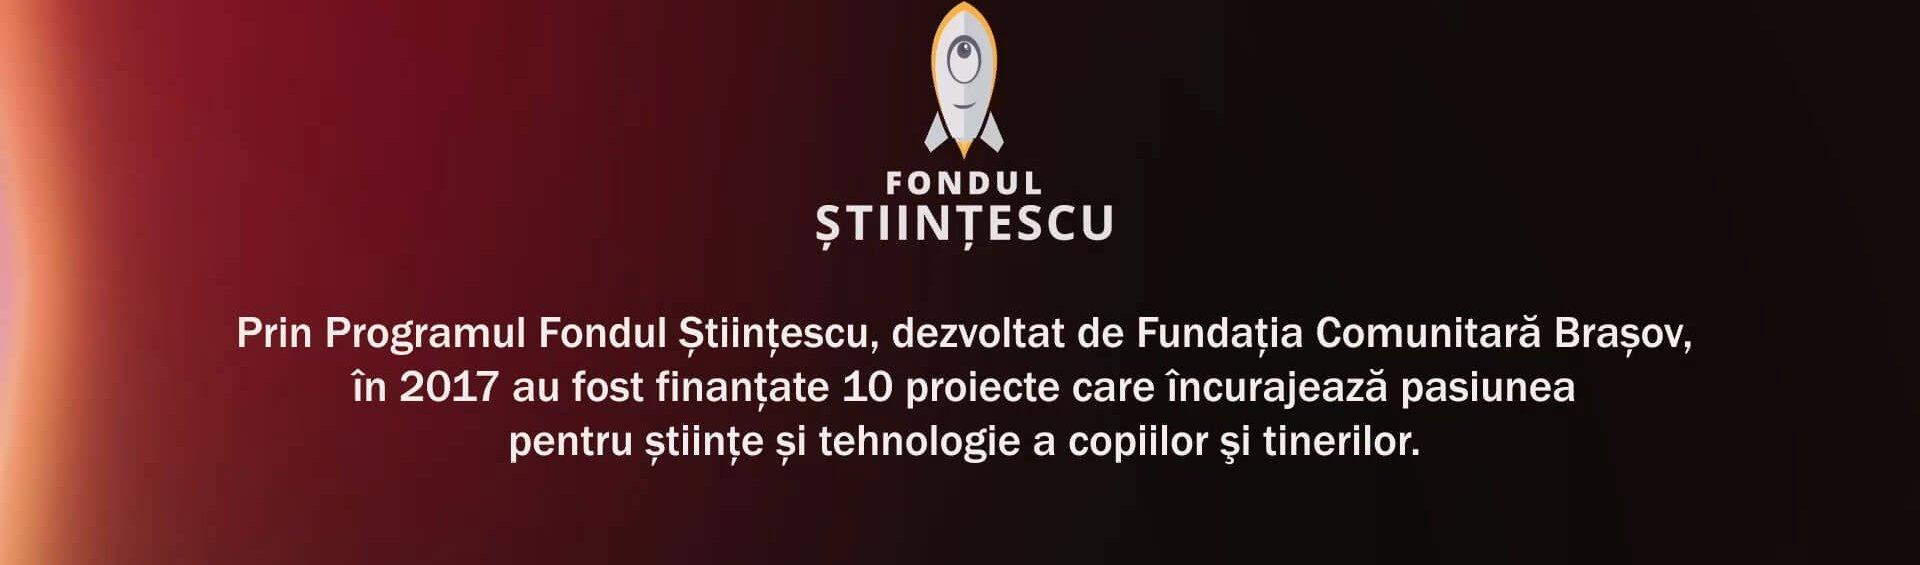 Fondul Stiintescu 2017